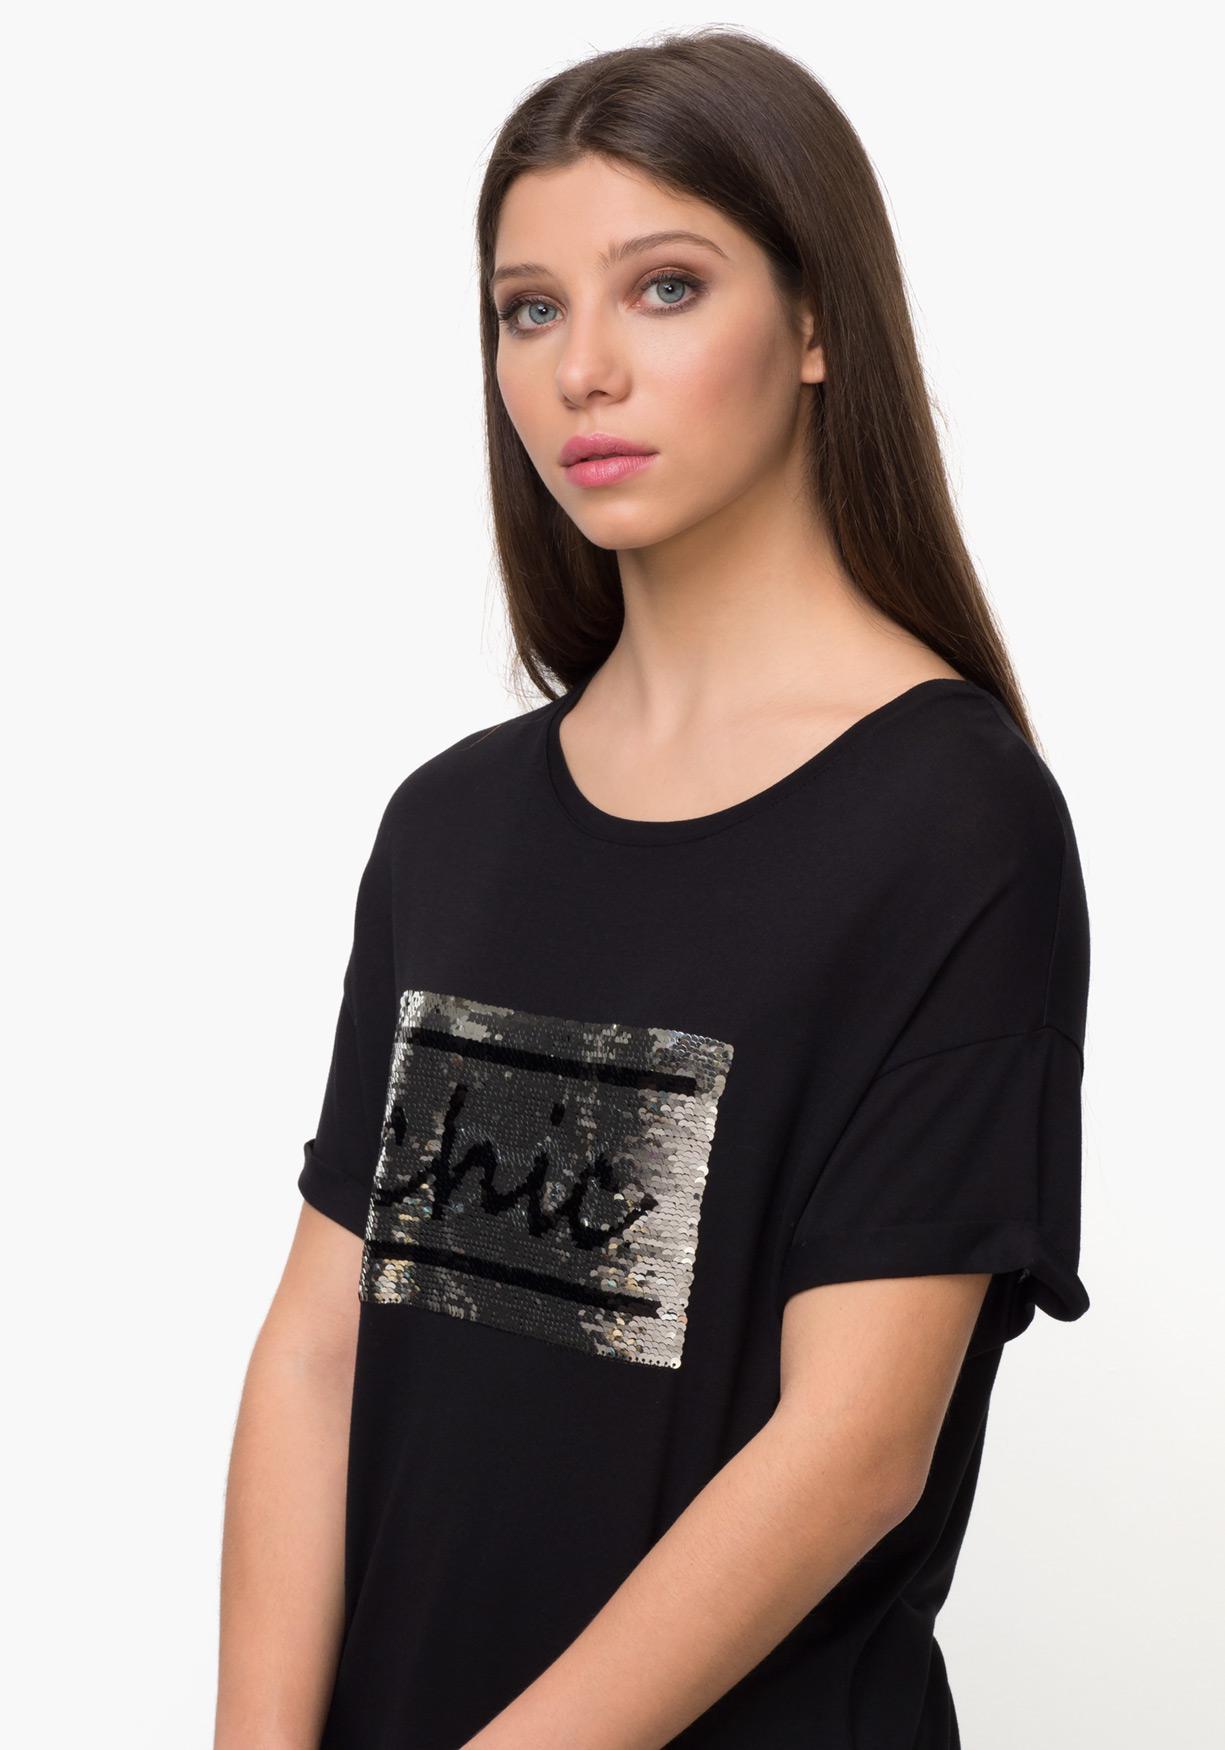 Comprar Mujer Lentejuelas De ¡aprovéchate Tex Camiseta Con raqfZrw e20676d676fa